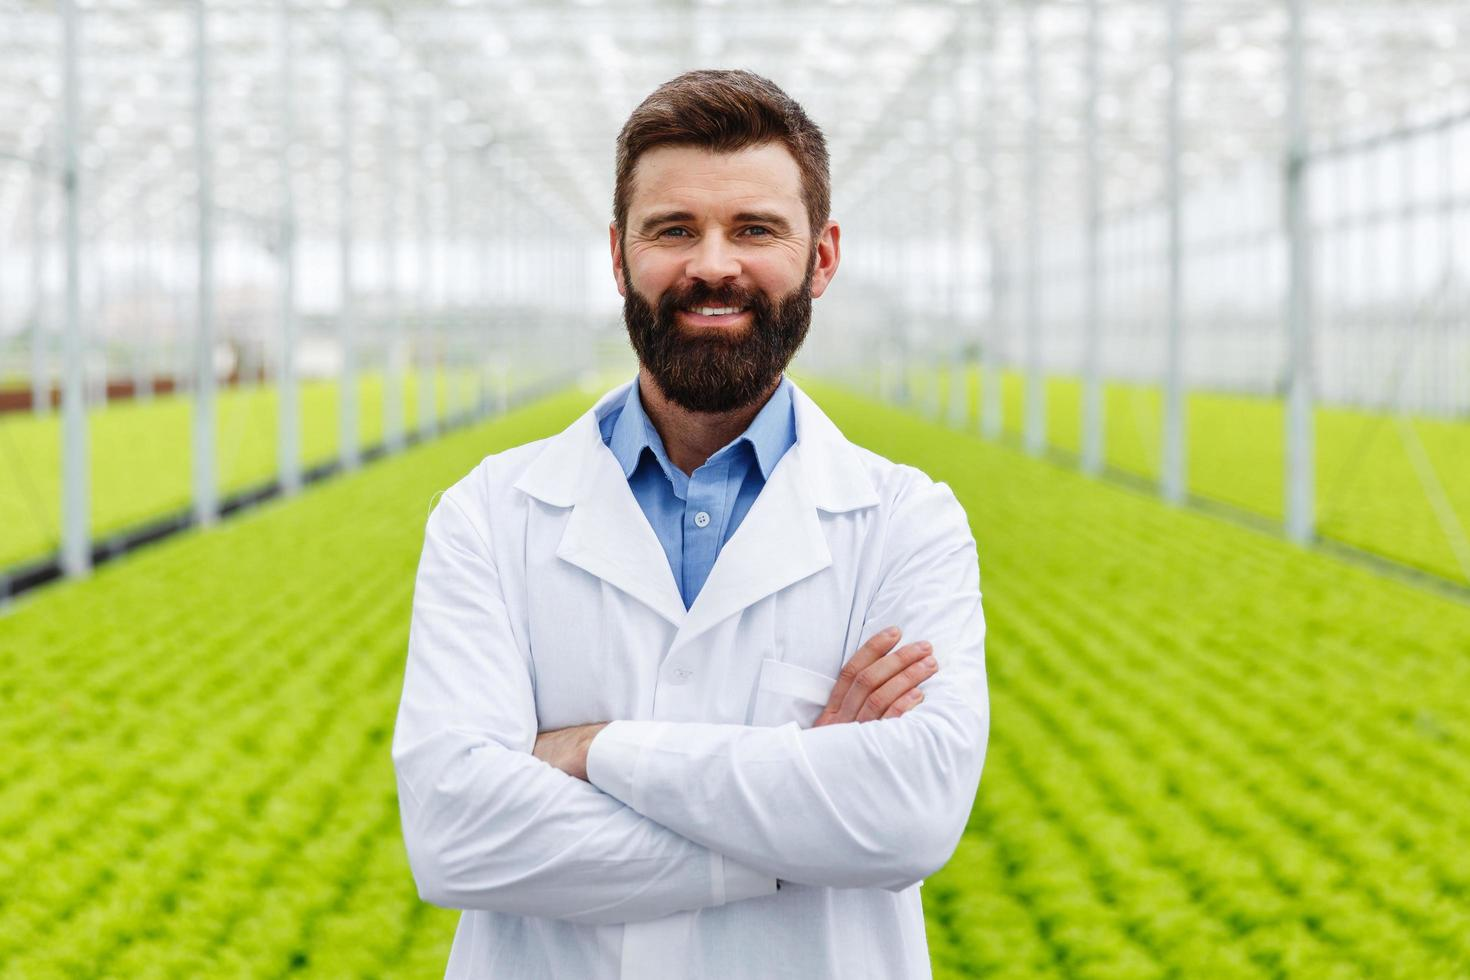 ricercatore scientifico maschio foto